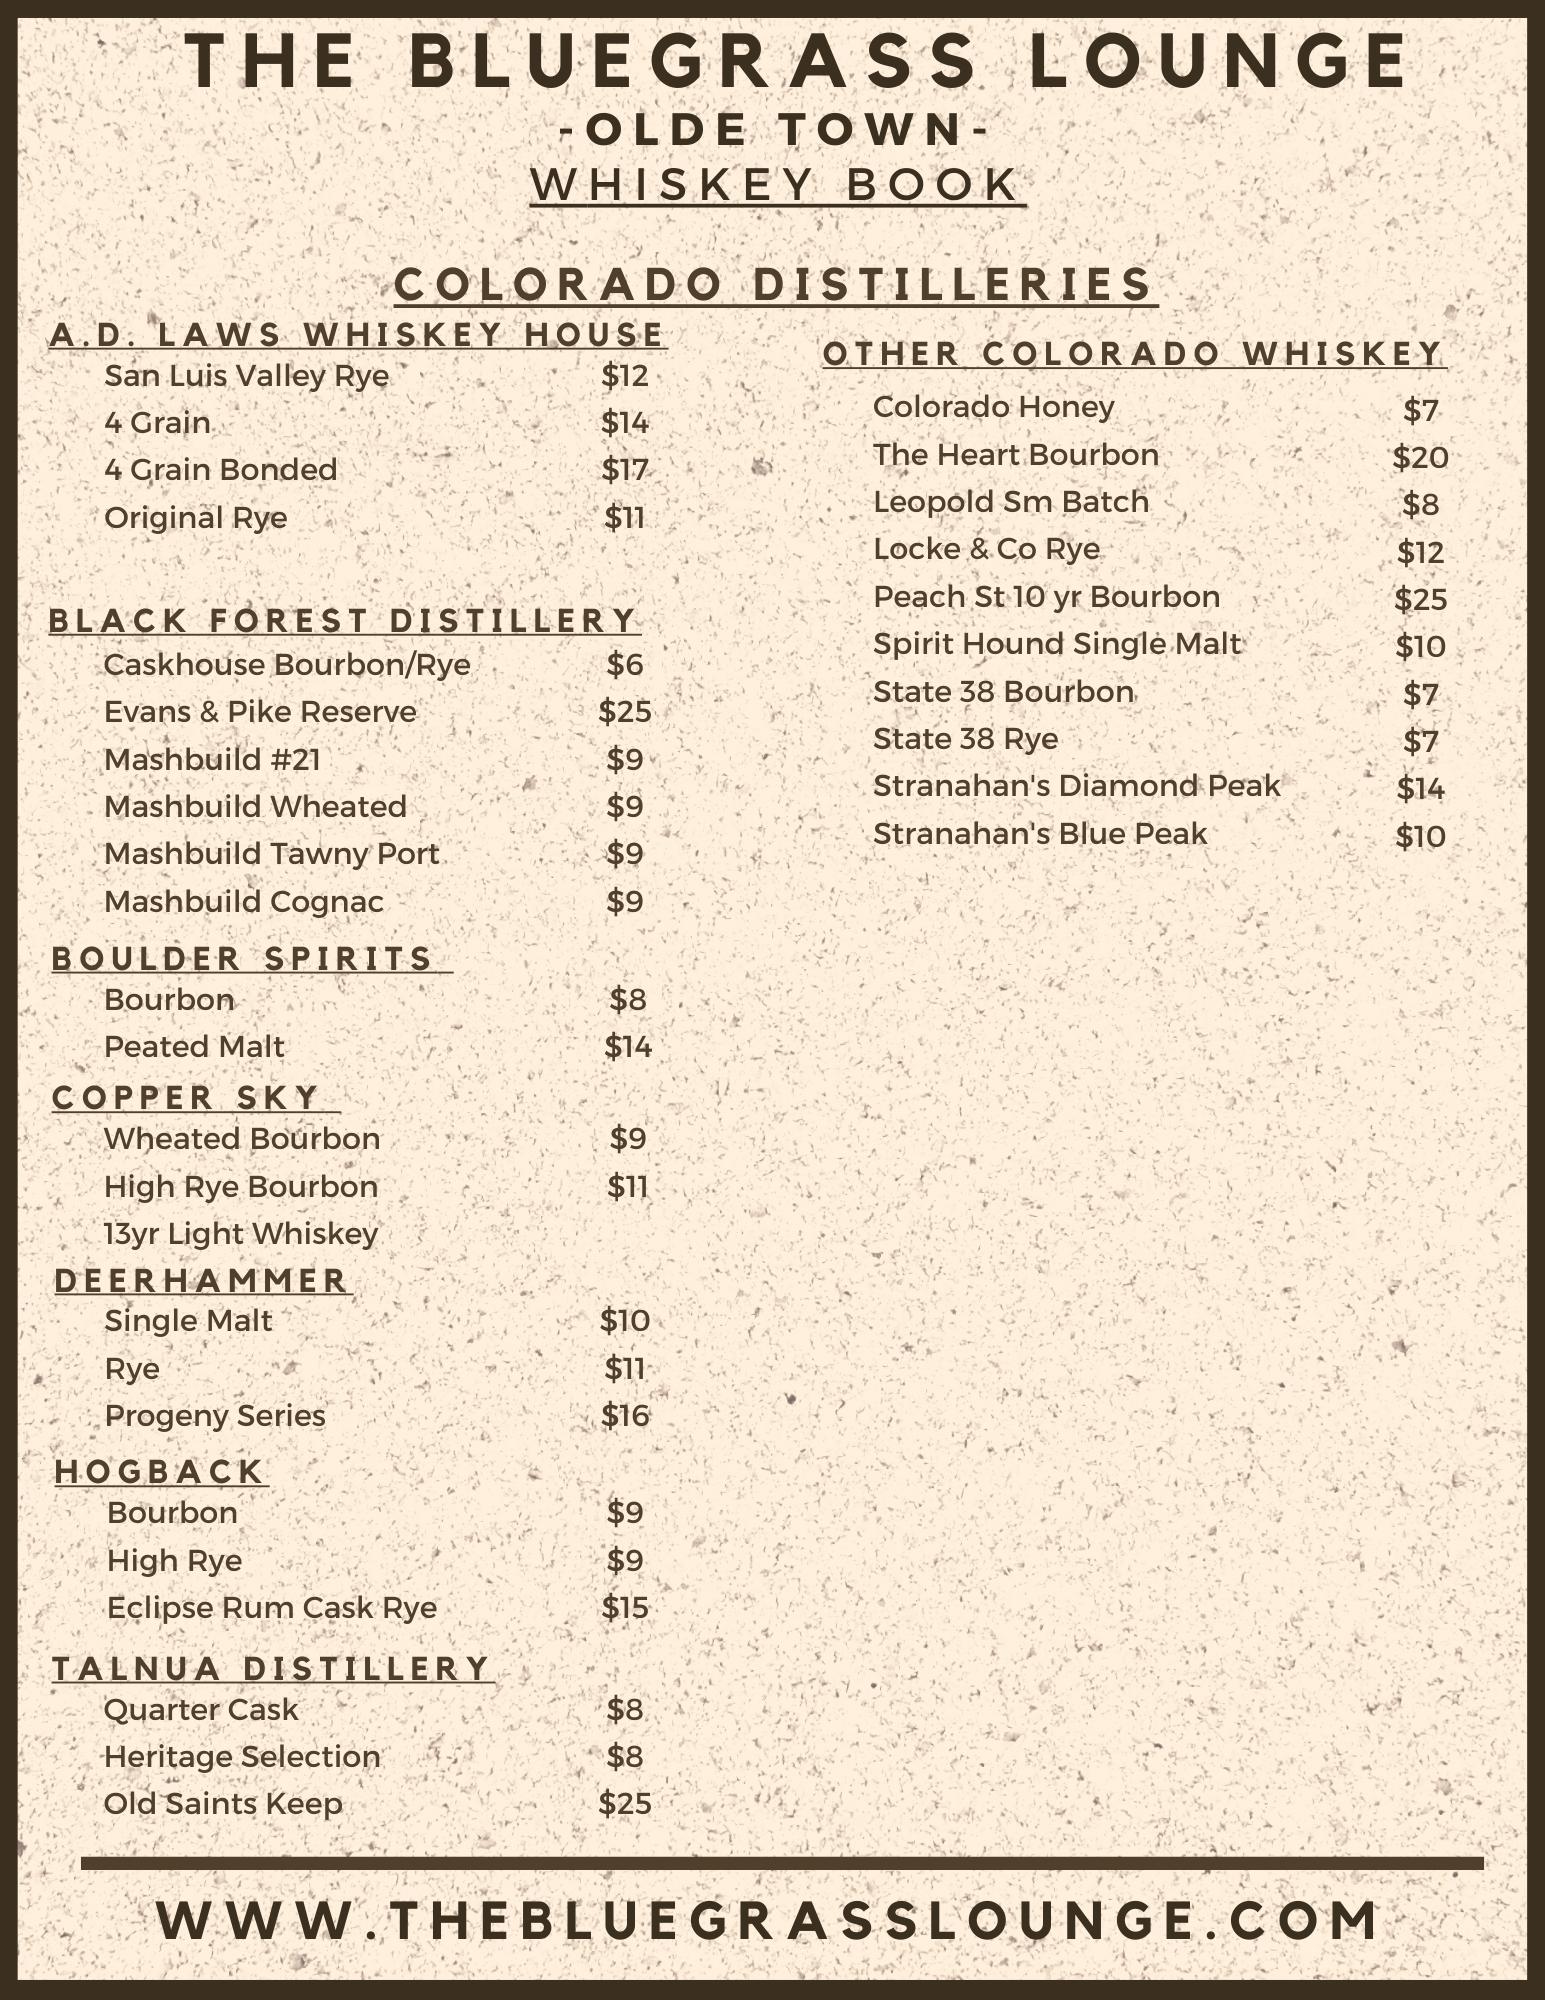 https://a.storyblok.com/f/94431/1545x2000/9af610f868/olde-town-whiskey-book-22.png